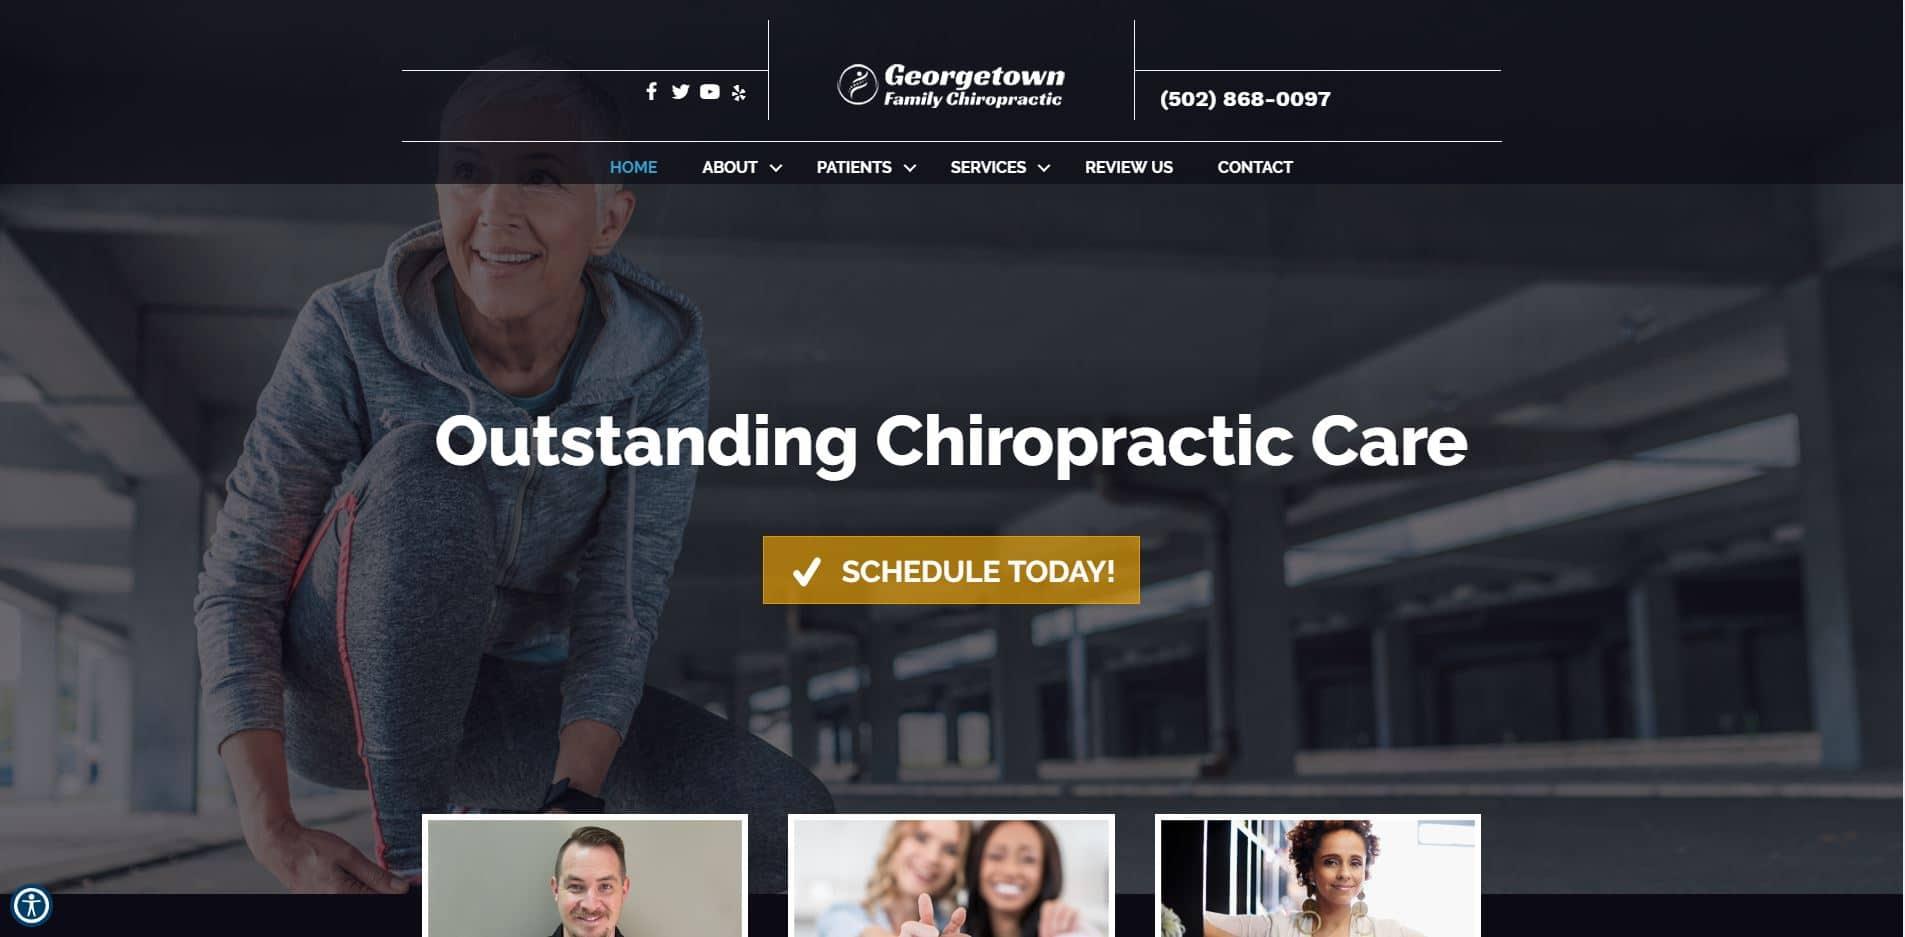 Chiropractor in Georgetown